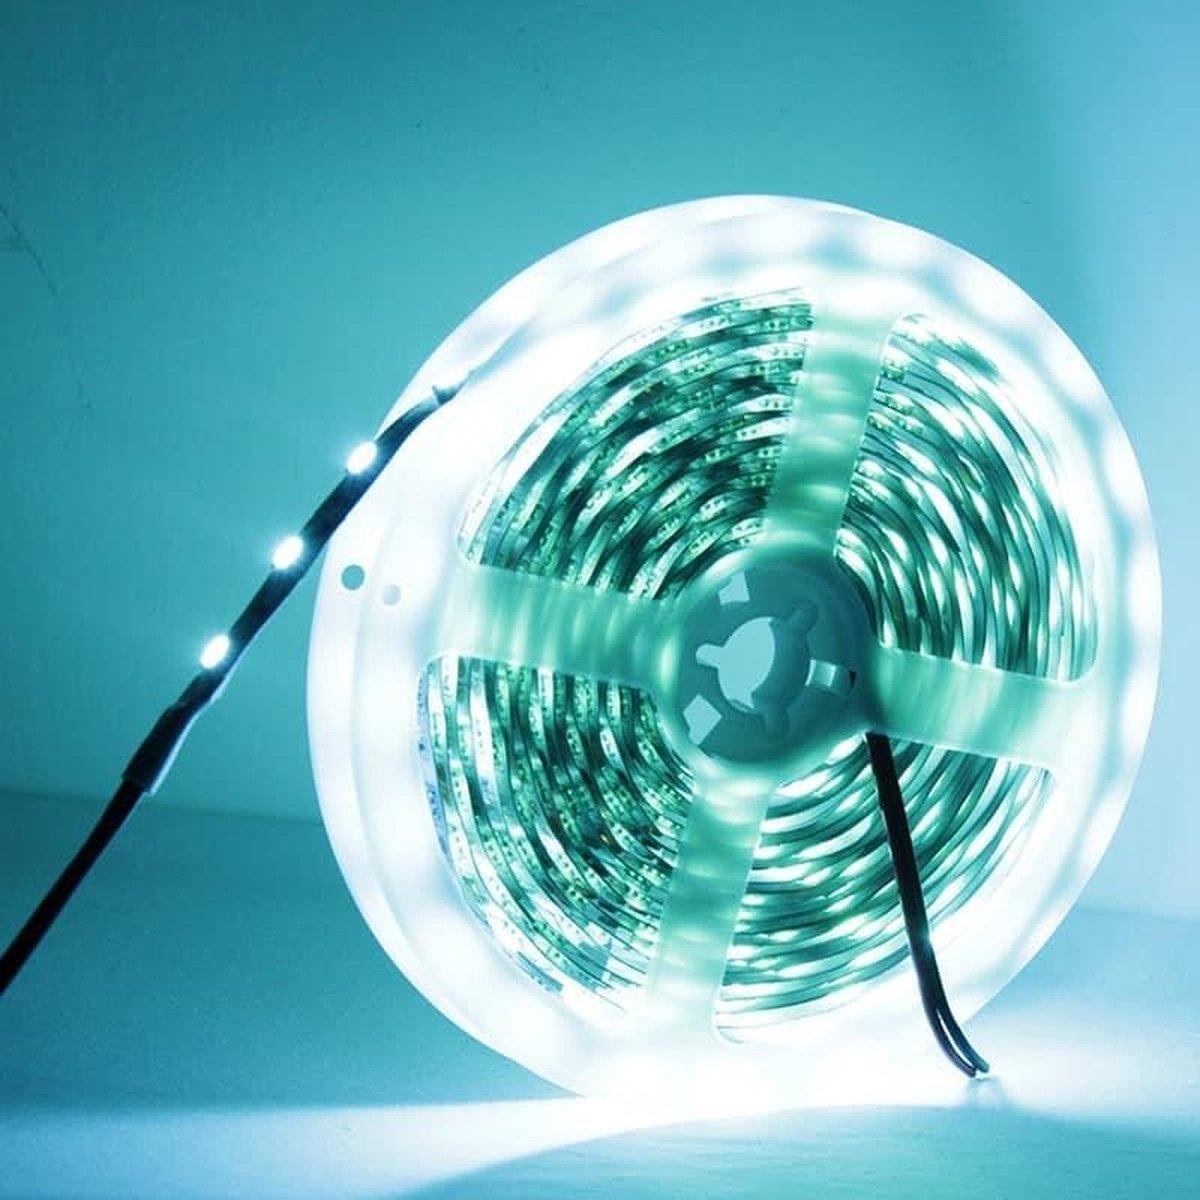 14,4W Ice Blue Light LED Lichtslang, Blank bord 5050 SMD, 60 LED / m, Lengte: 5m, Breedte: 10 mm (Ice Blue Light)